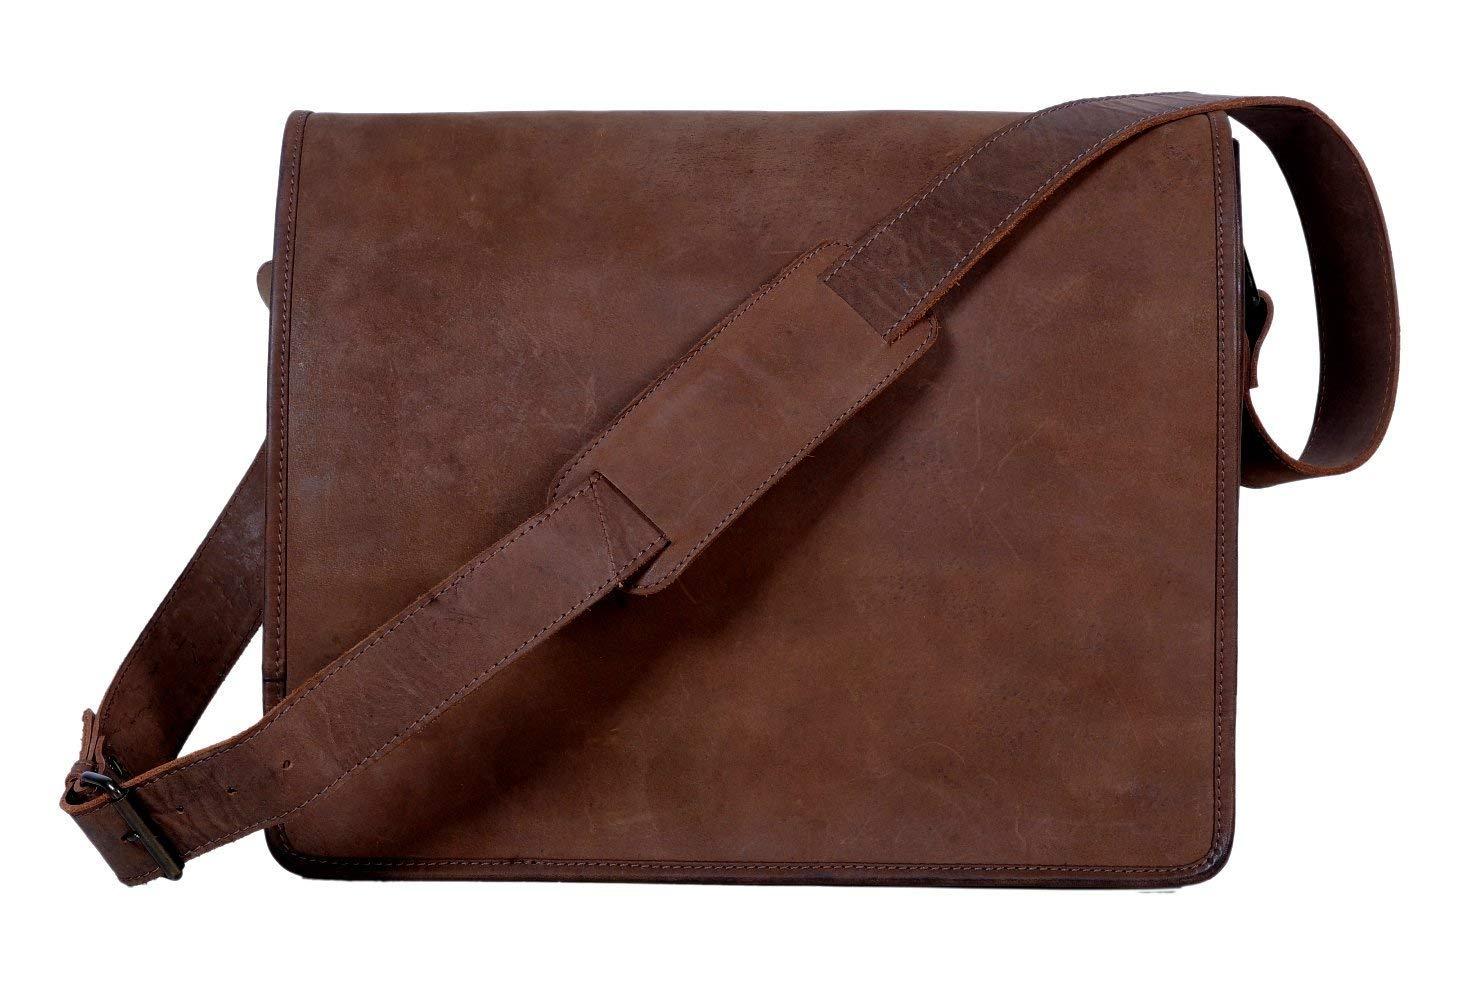 9bd02ec447 Amazon.com  Znt Bags15 inch Vintage Crossbody Genuine Leather Laptop  Messenger Bag  ZNT bAGS